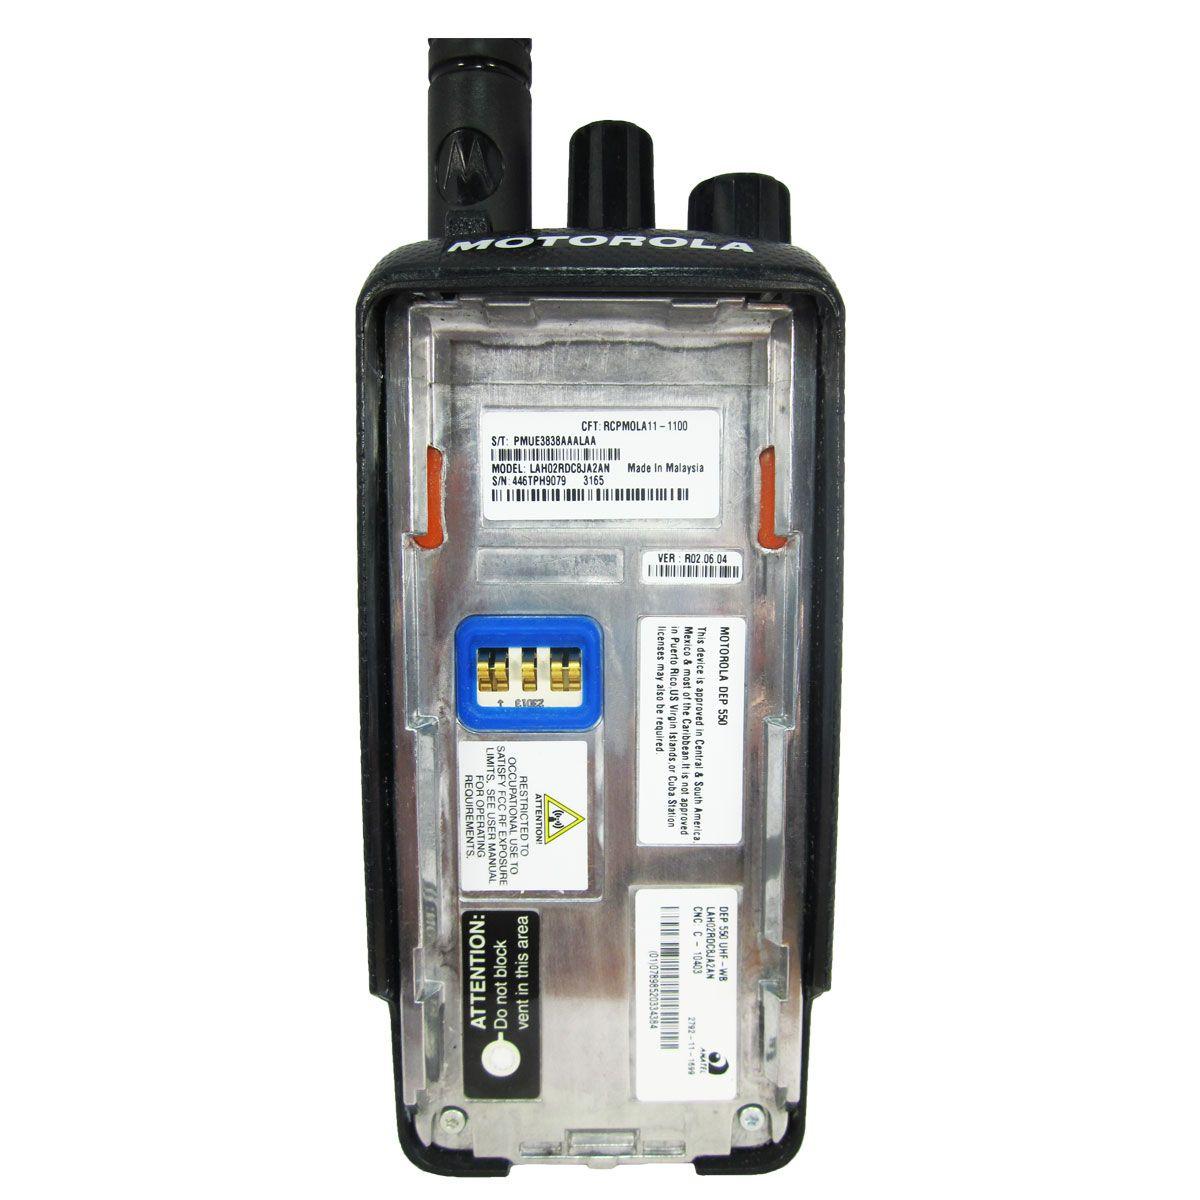 Radio Motorola DEP550 Digital